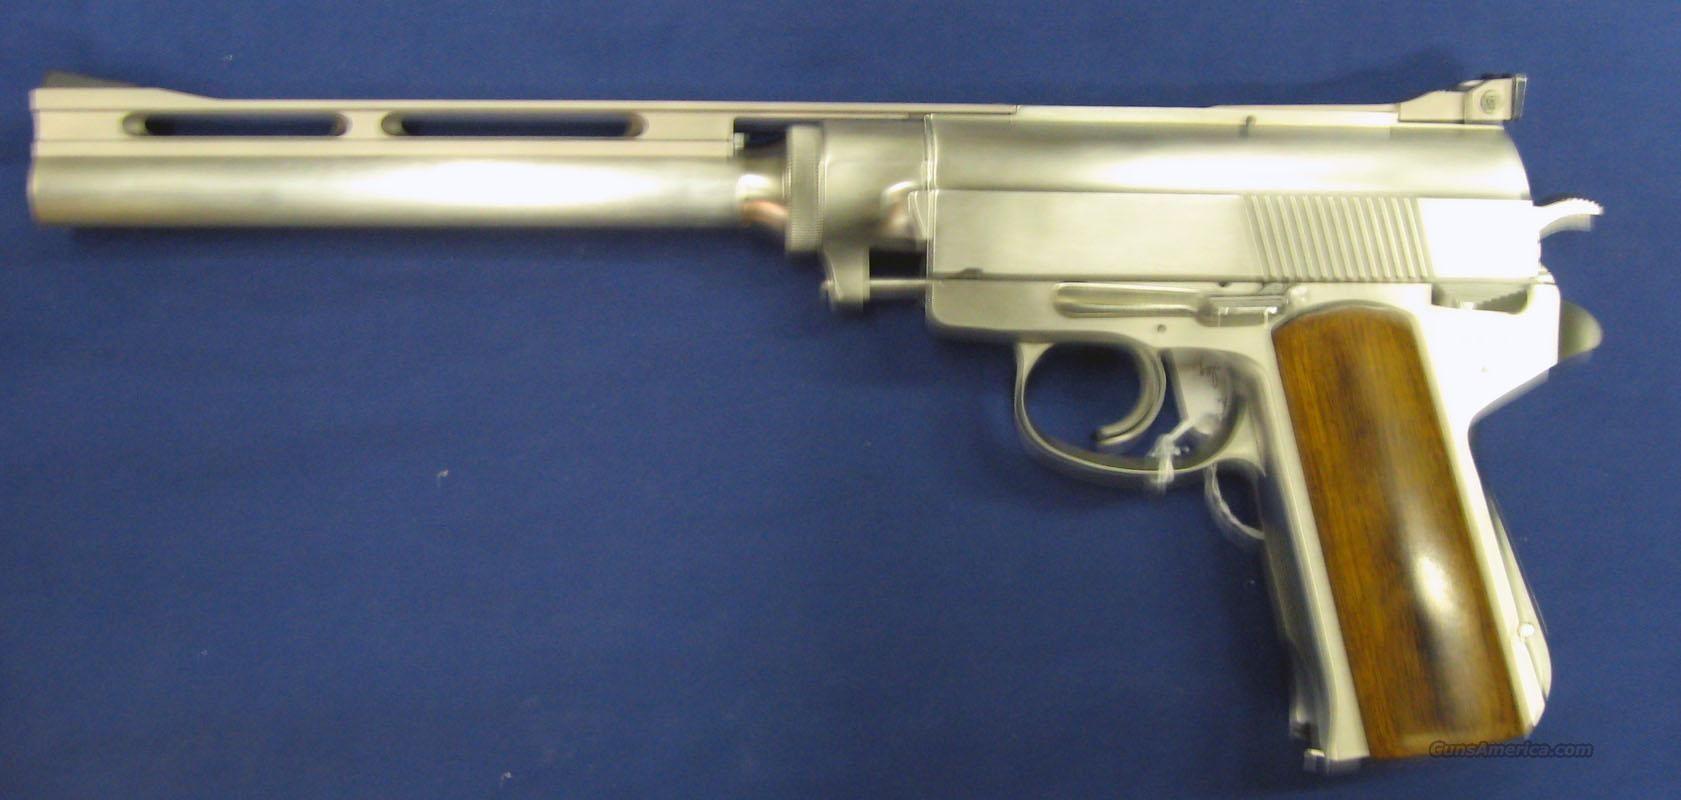 Wildey Hunter Pistol 475 Wildey Mag For Sale Pistol Reloading Dies Magnum